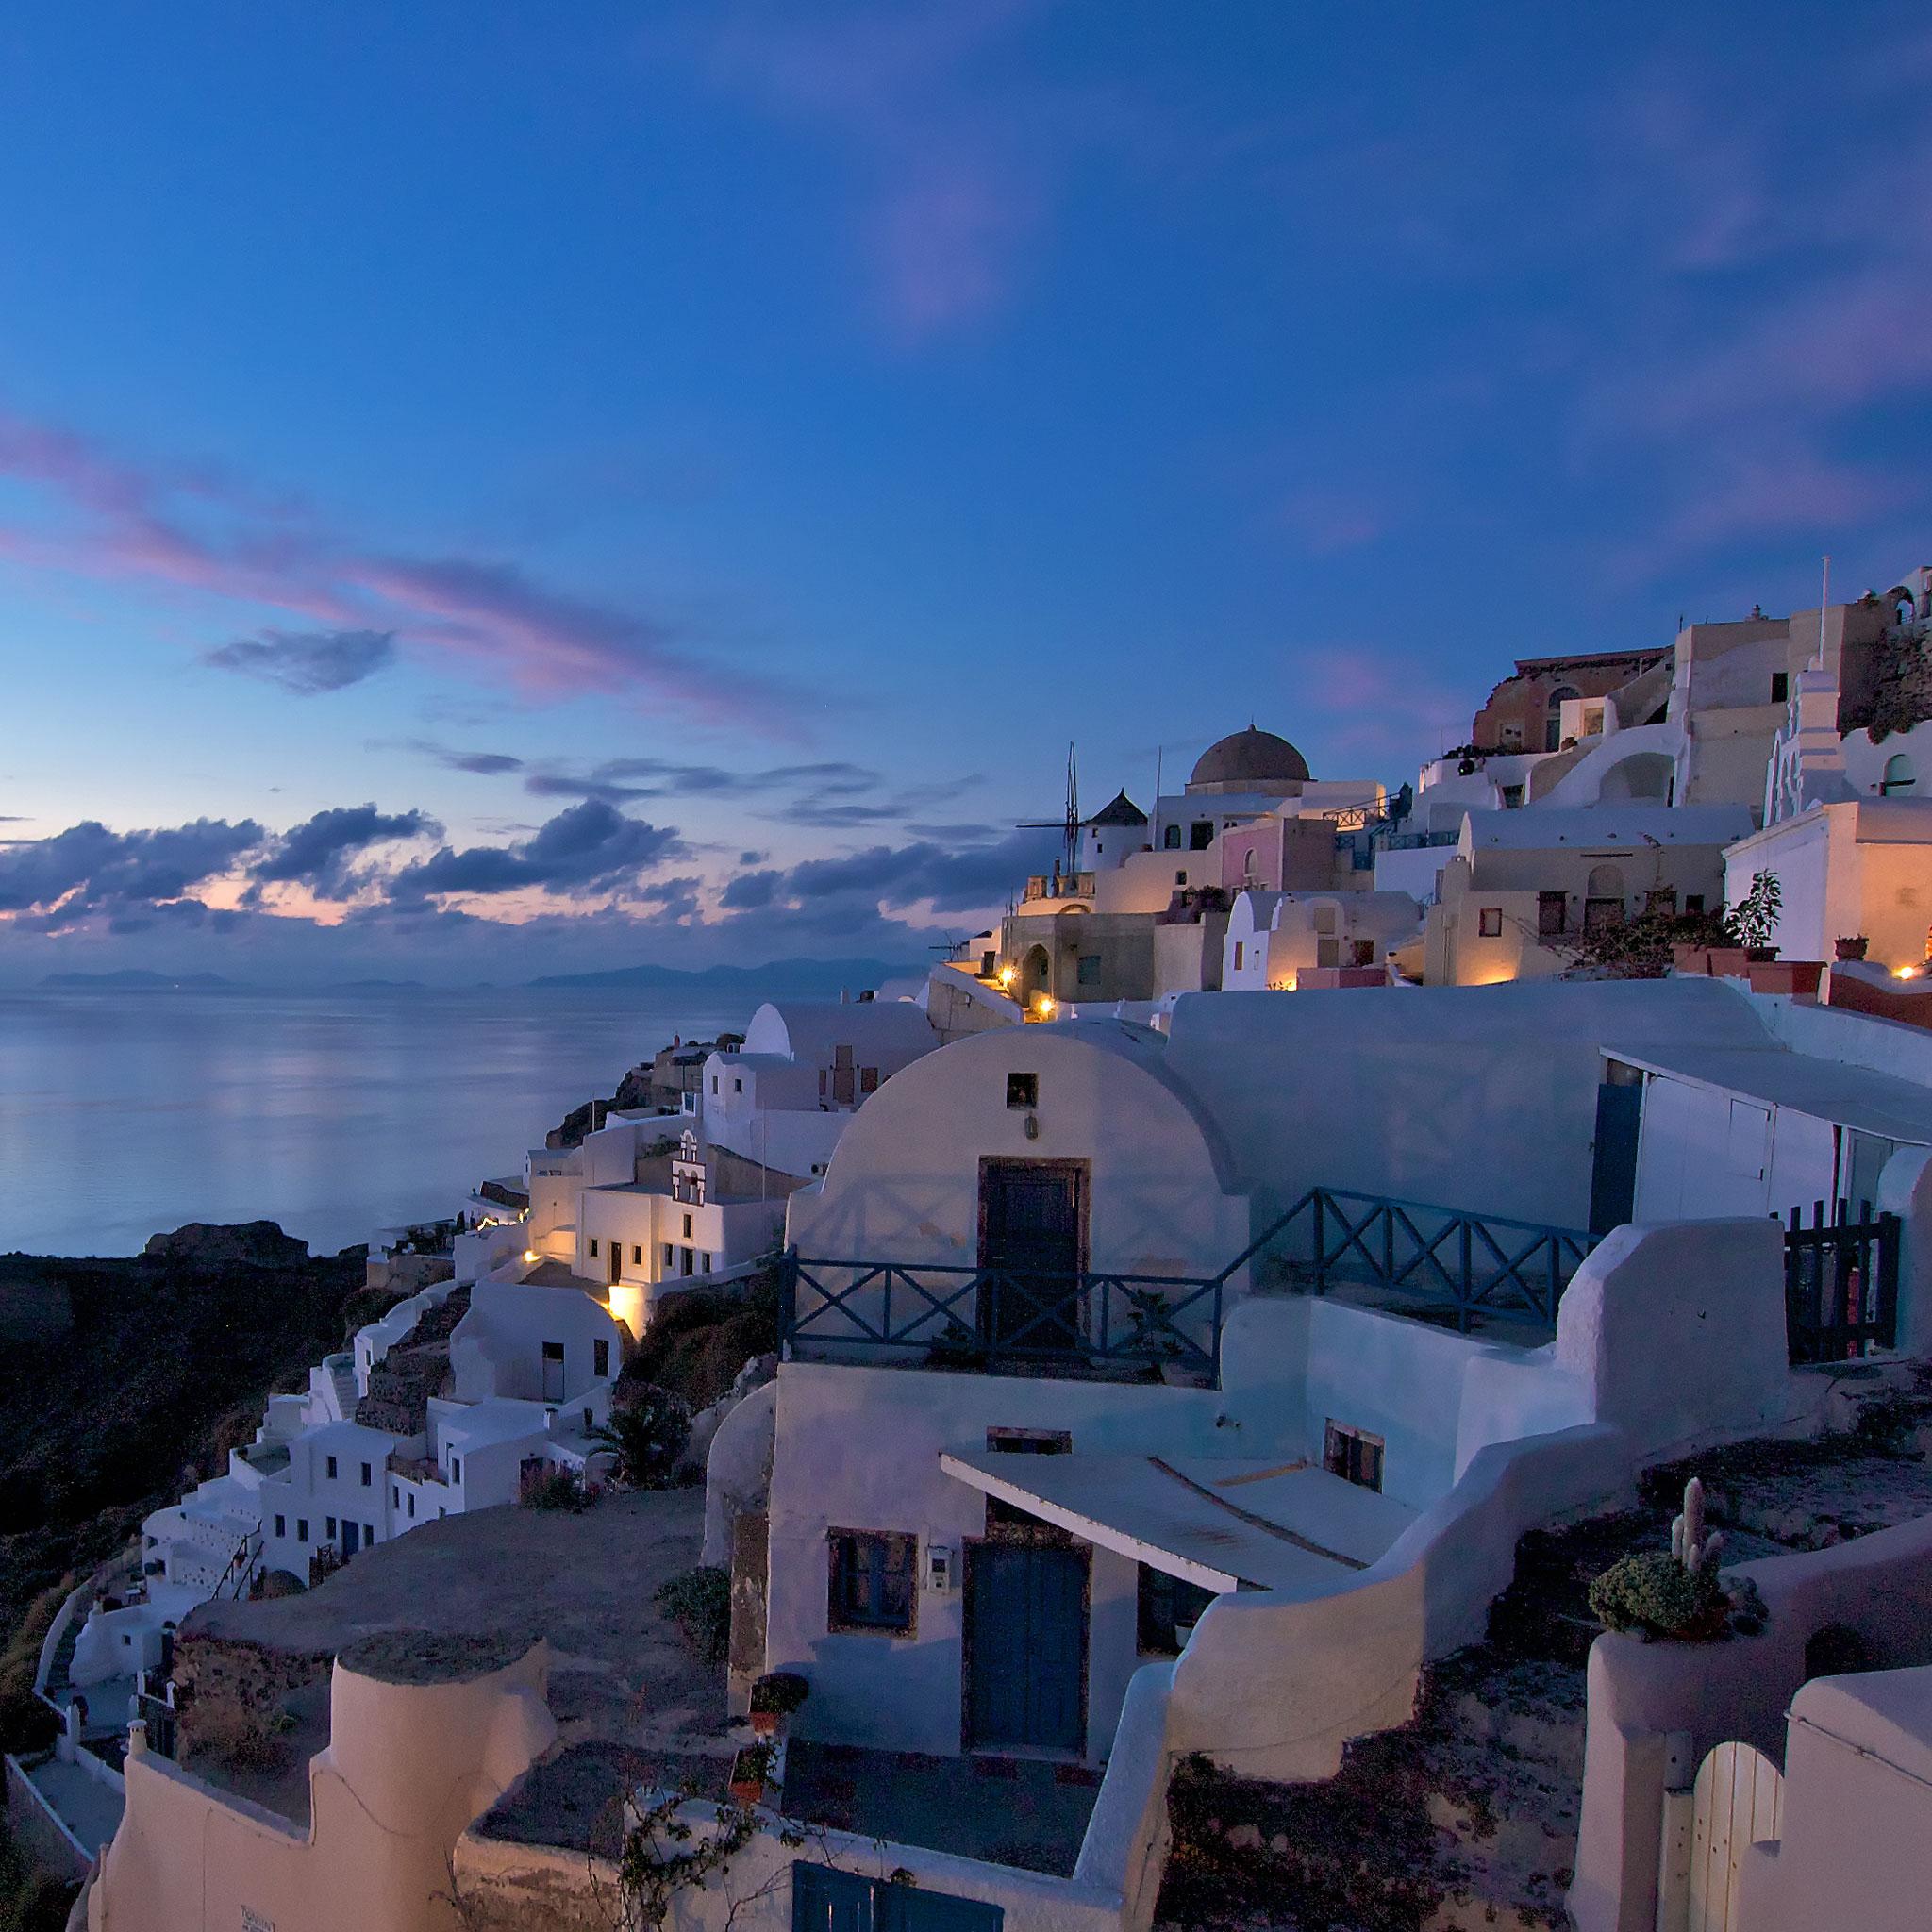 Greece-3Wallpapers-ipad-Retina